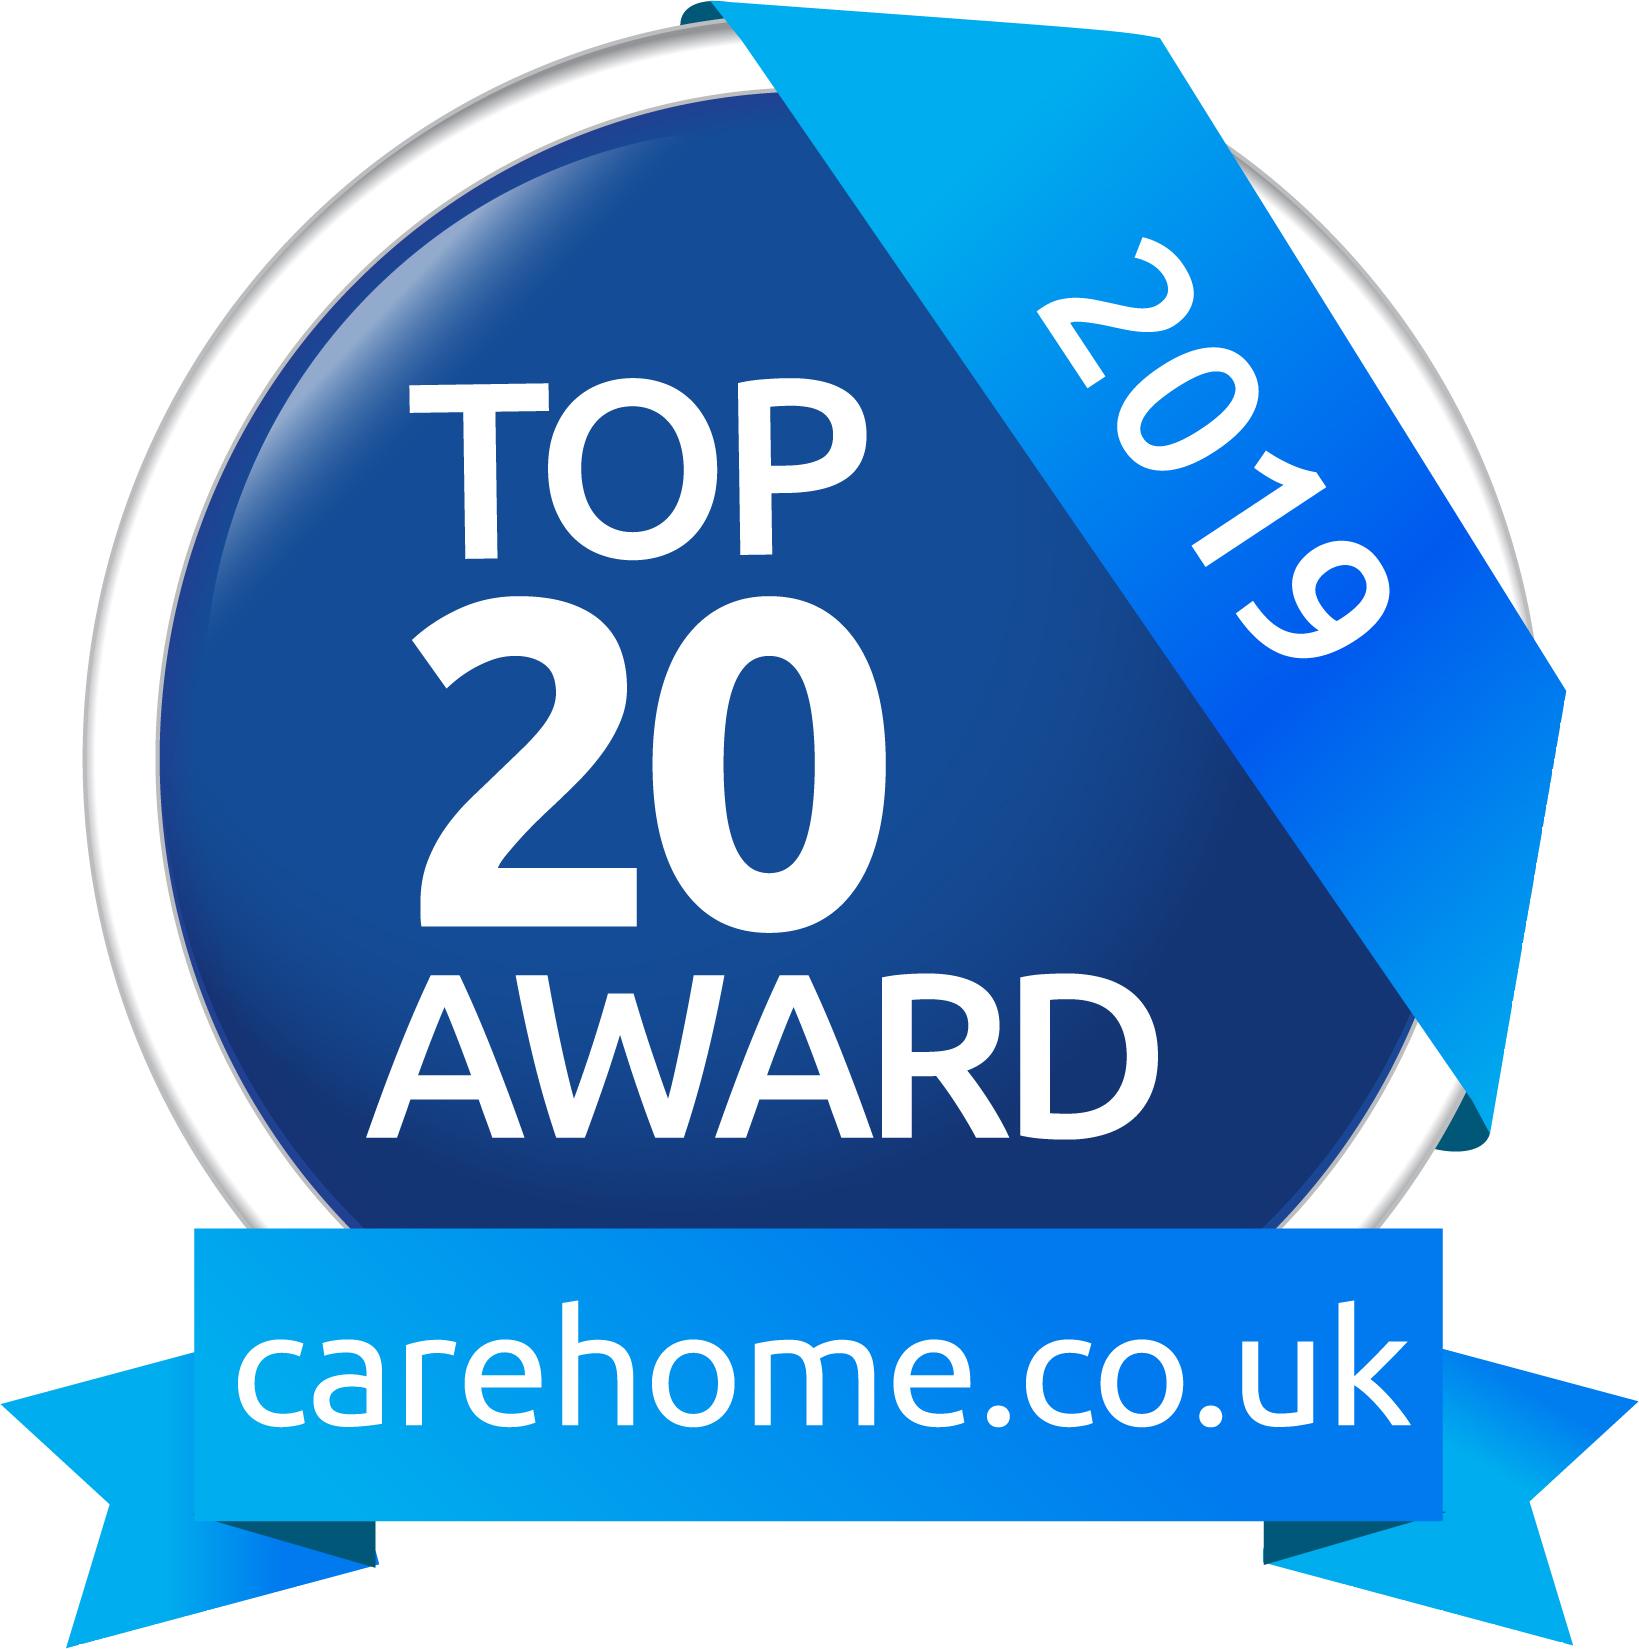 carehome.co_.uk-Individual-Award-2019.png